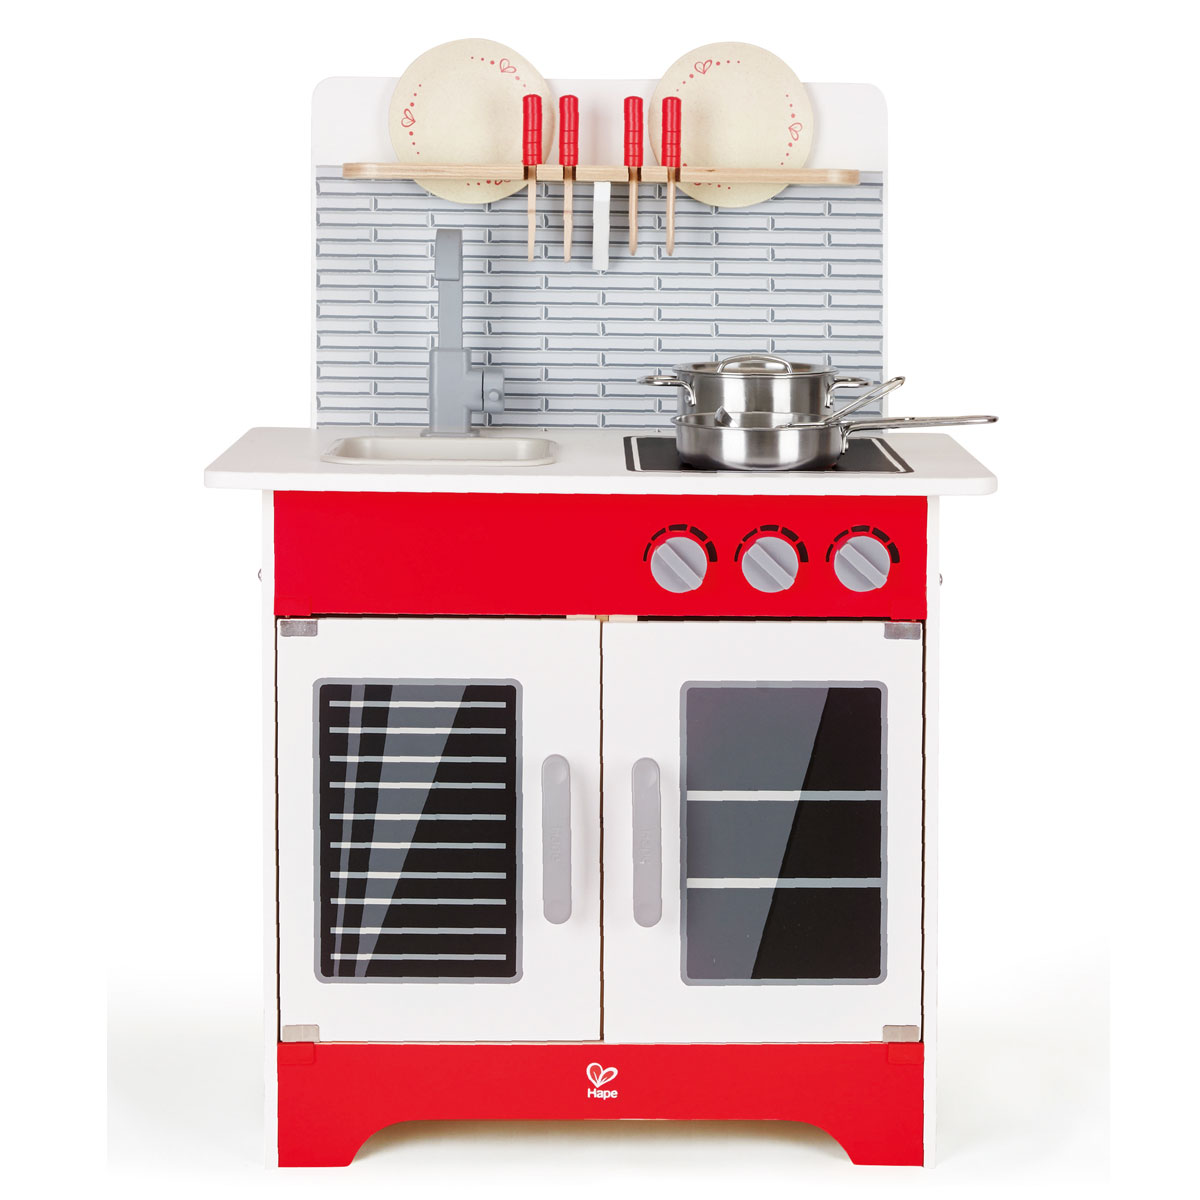 Hape kinderkuche stadtcafe spielkuche aus holz e3144 for Hape kinderküche